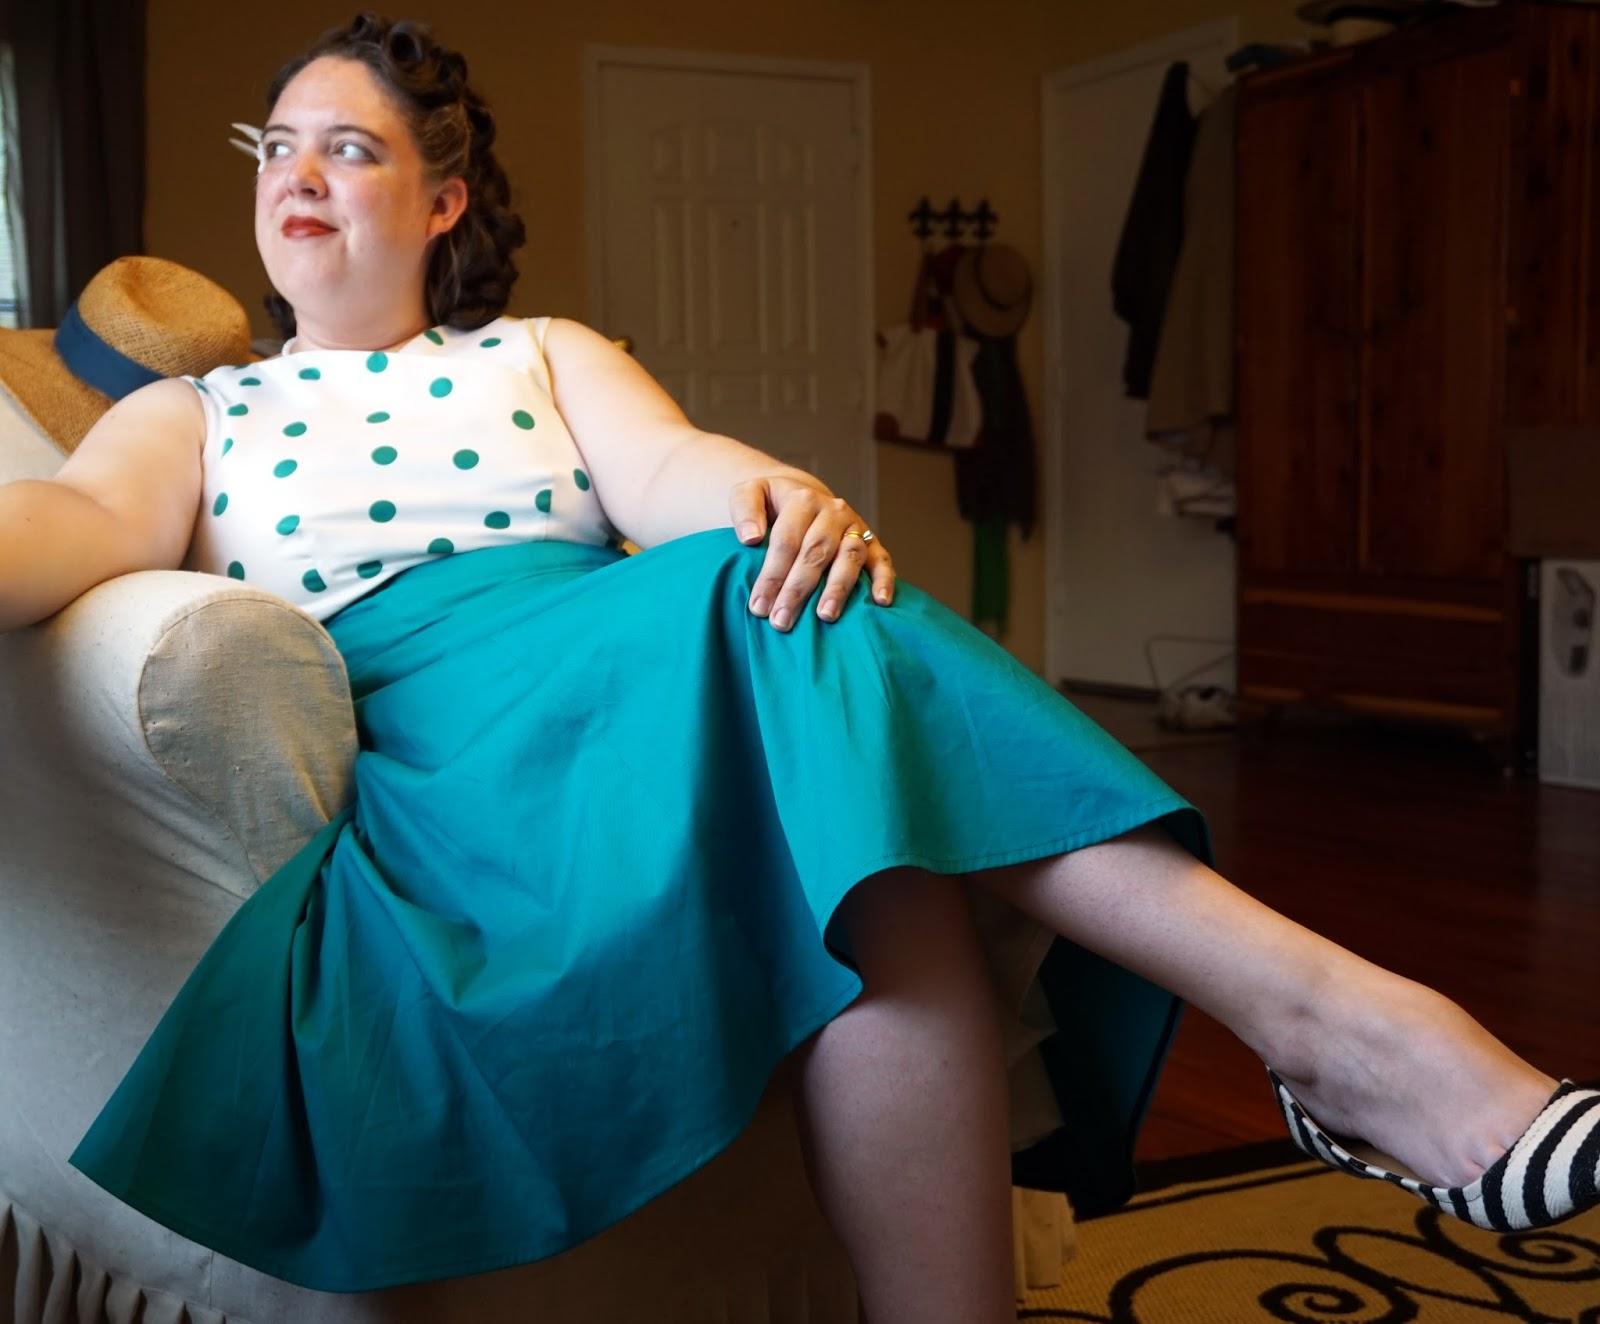 Aux Belles Choses: Teal Polka Dot Tea Dress - Butterick 5603